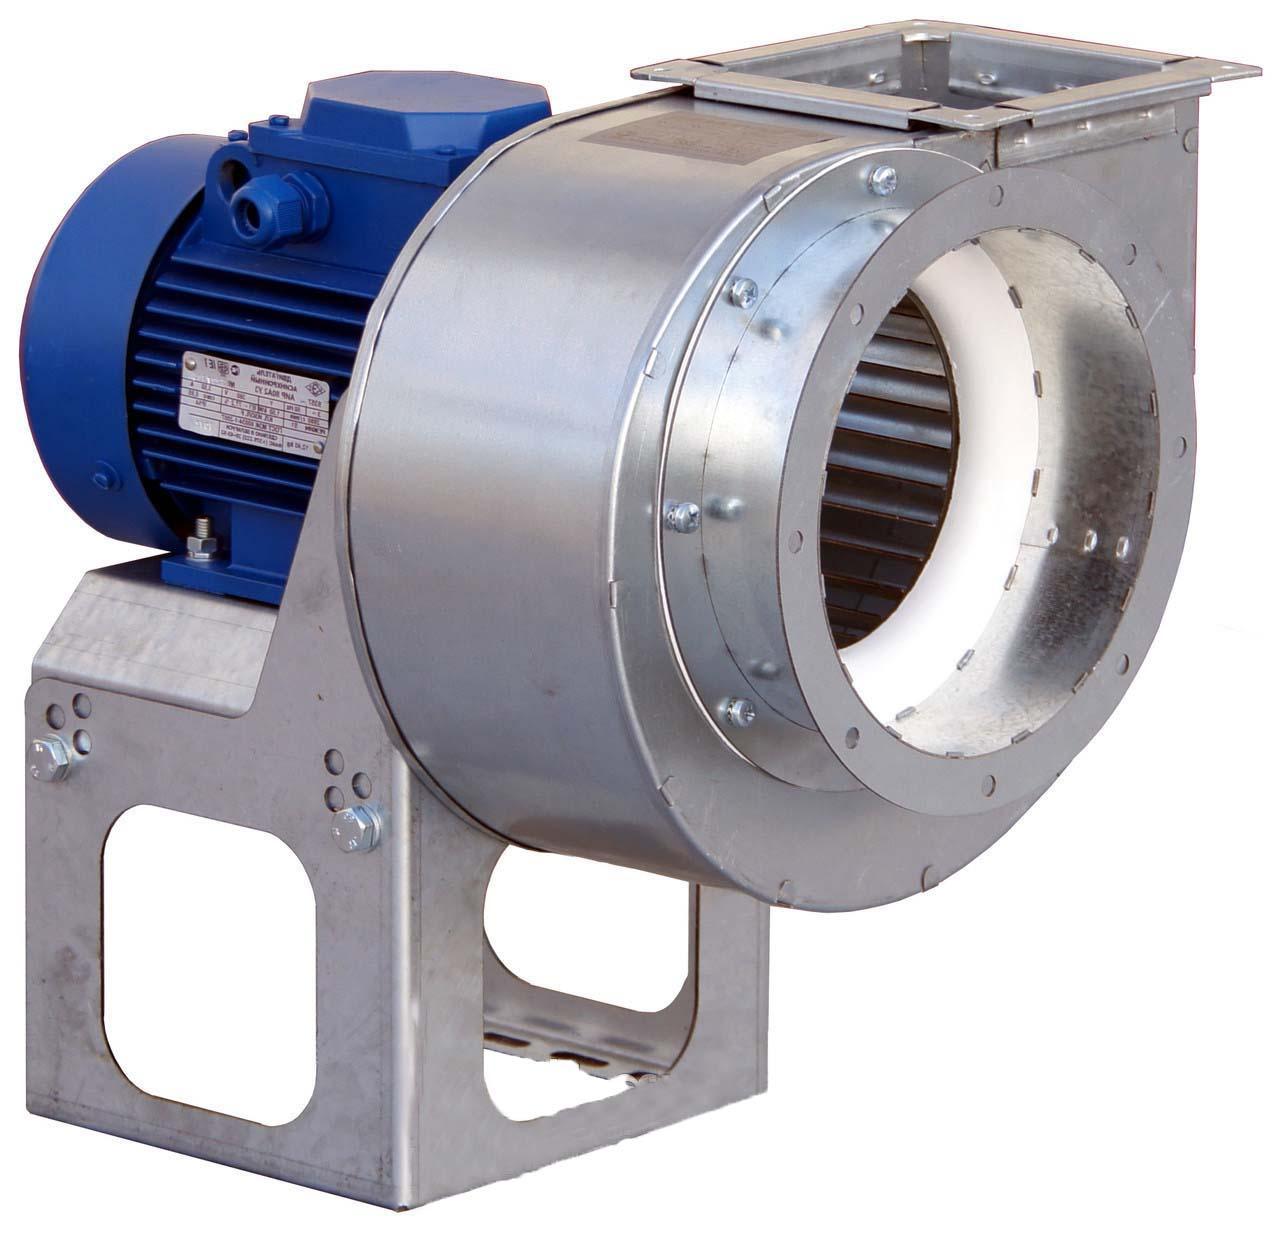 Вентилятор ВР 300-45-2 сх.1 (0,37х1500) (Лев 270 град.)